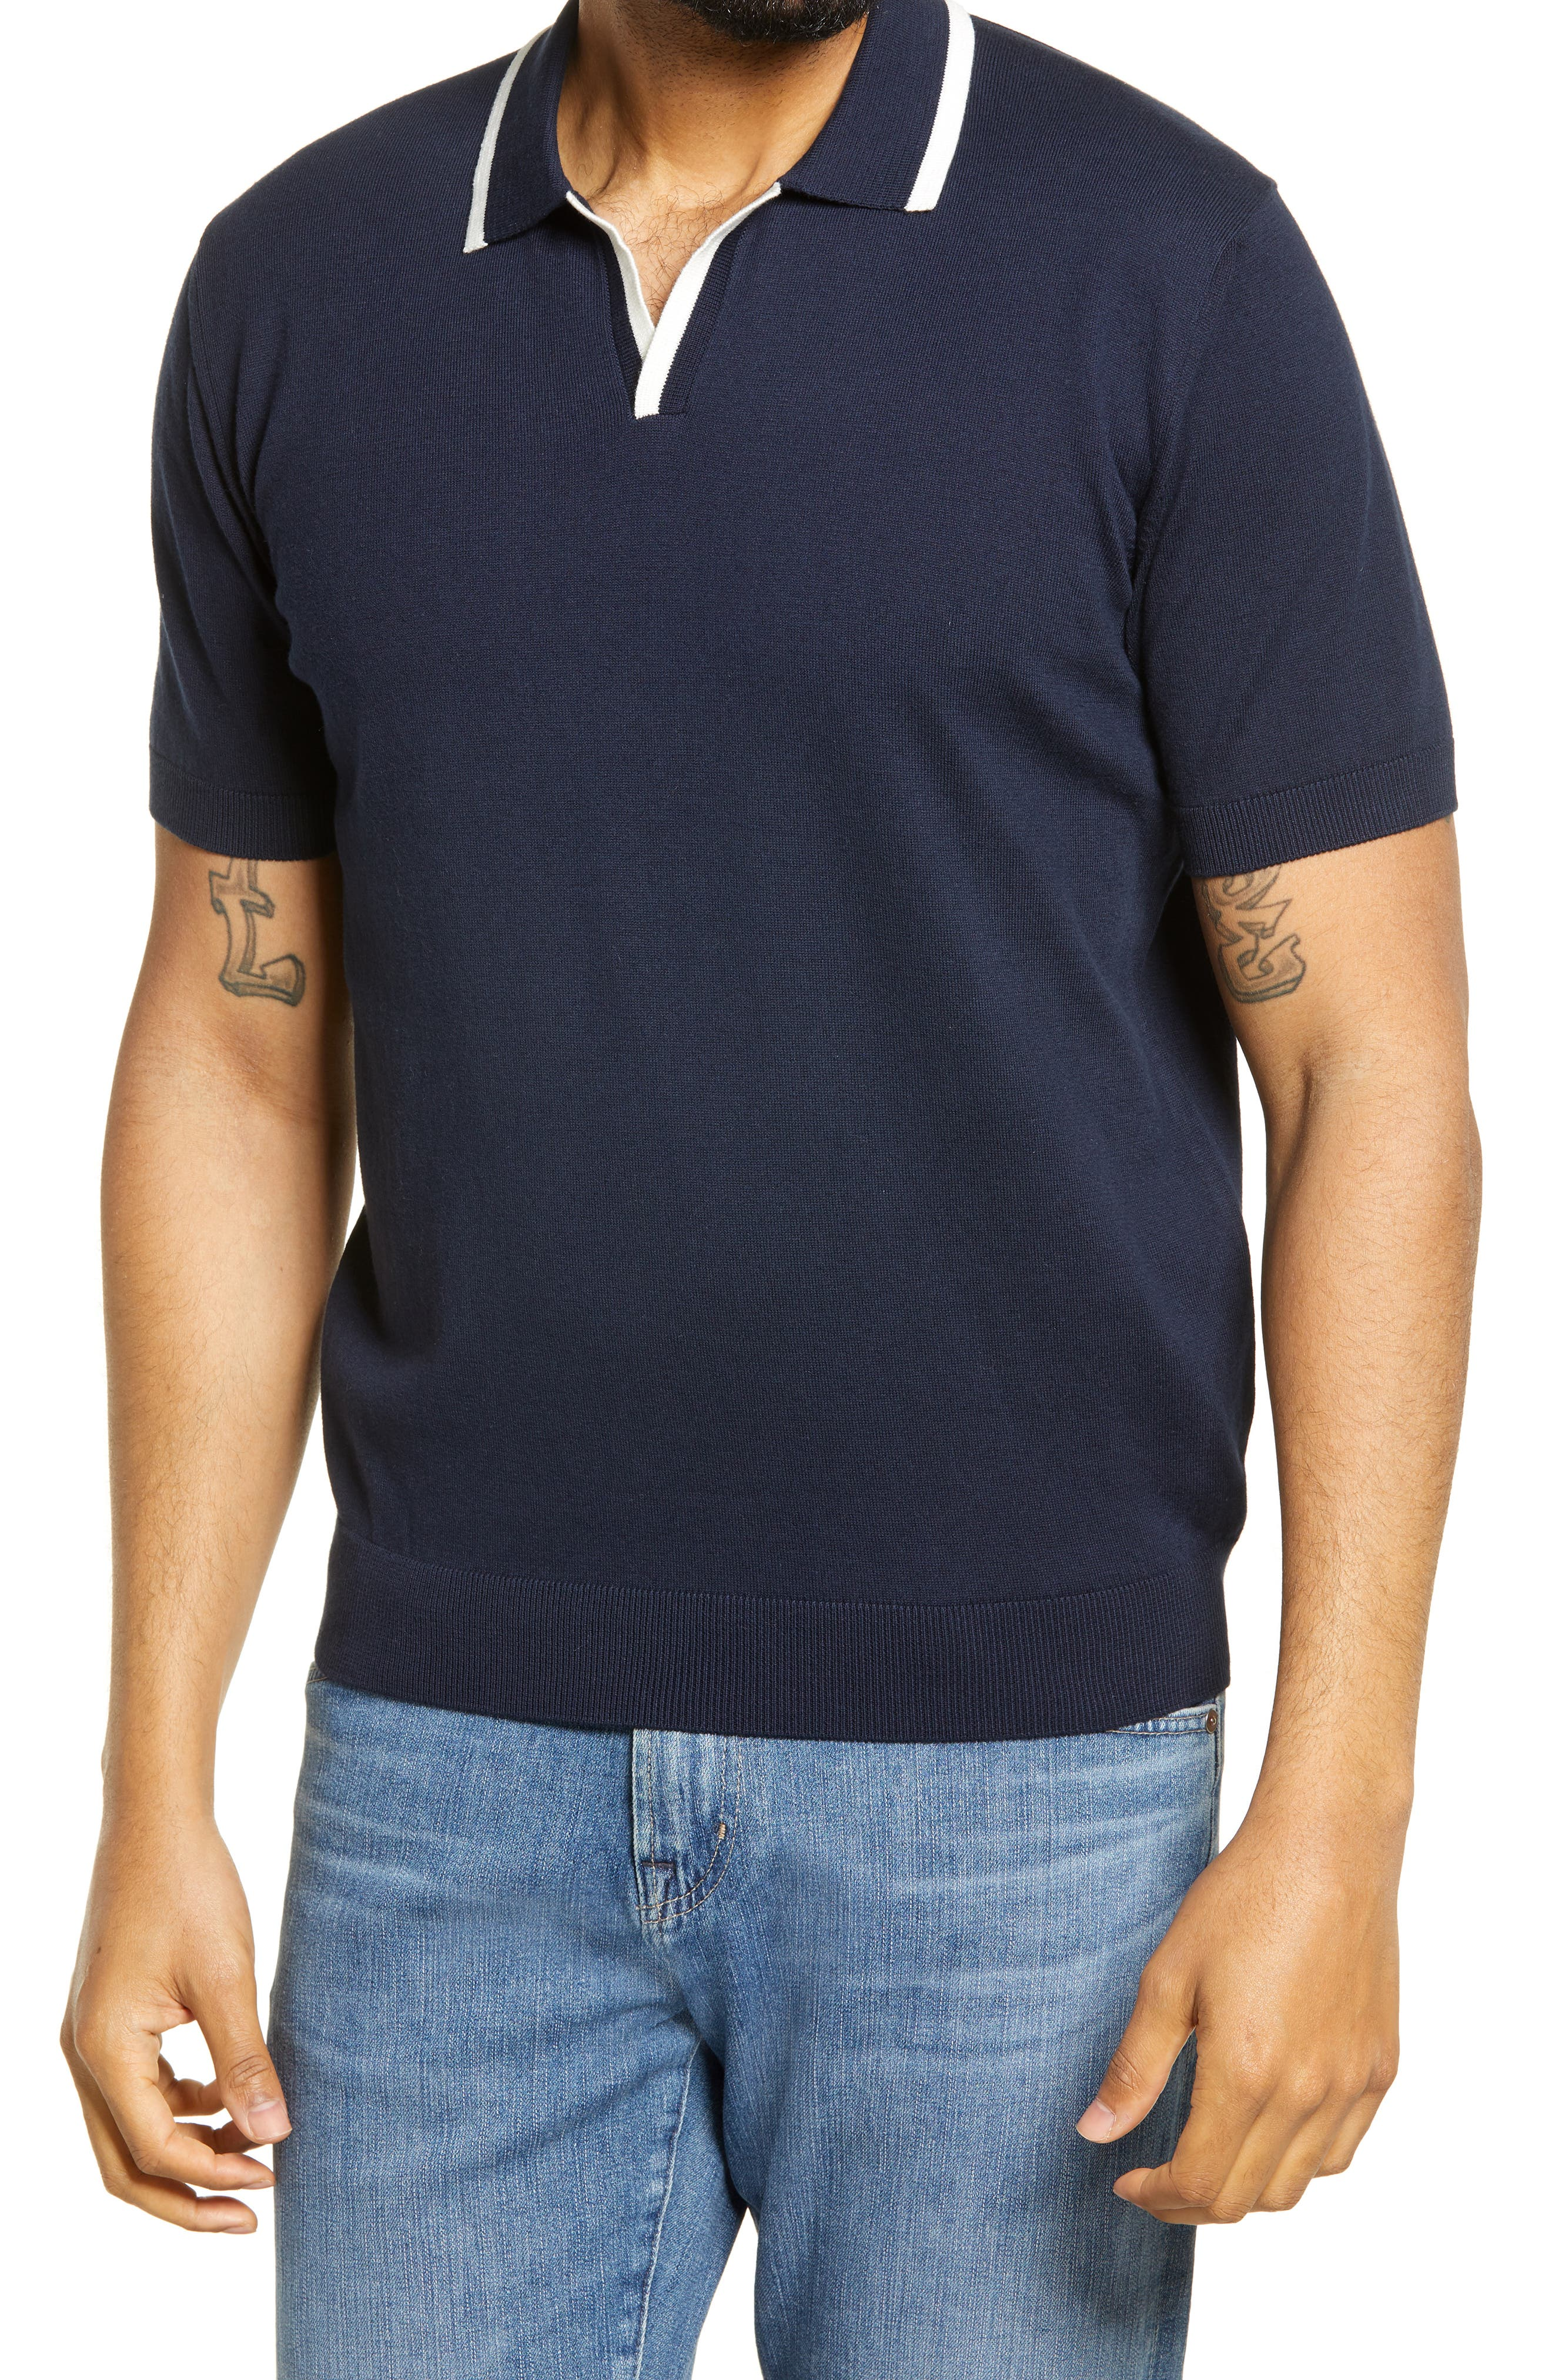 Easy 1940s Men's Fashion Guide Mens Bugatchi Short Sleeve Sweater Size Medium - Blue $129.00 AT vintagedancer.com